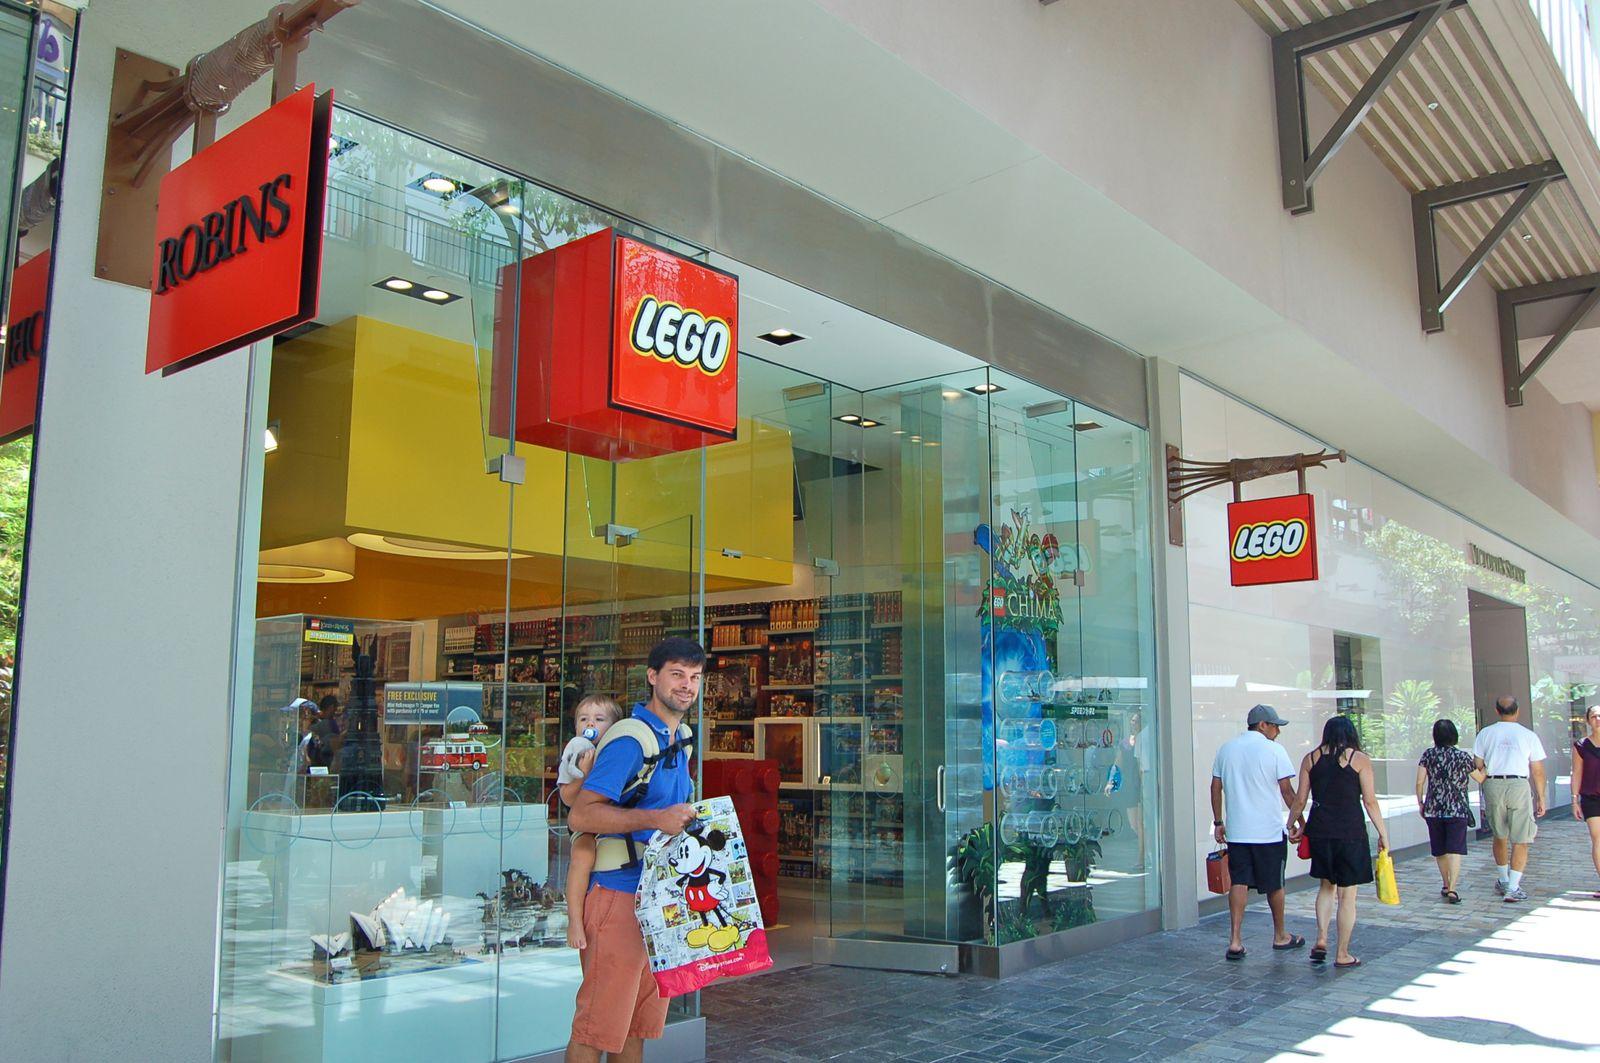 Disney Store, Lego Store et tout plein d'autres stores dans l'énooooooooooorme centre commercial Ala Moana Center